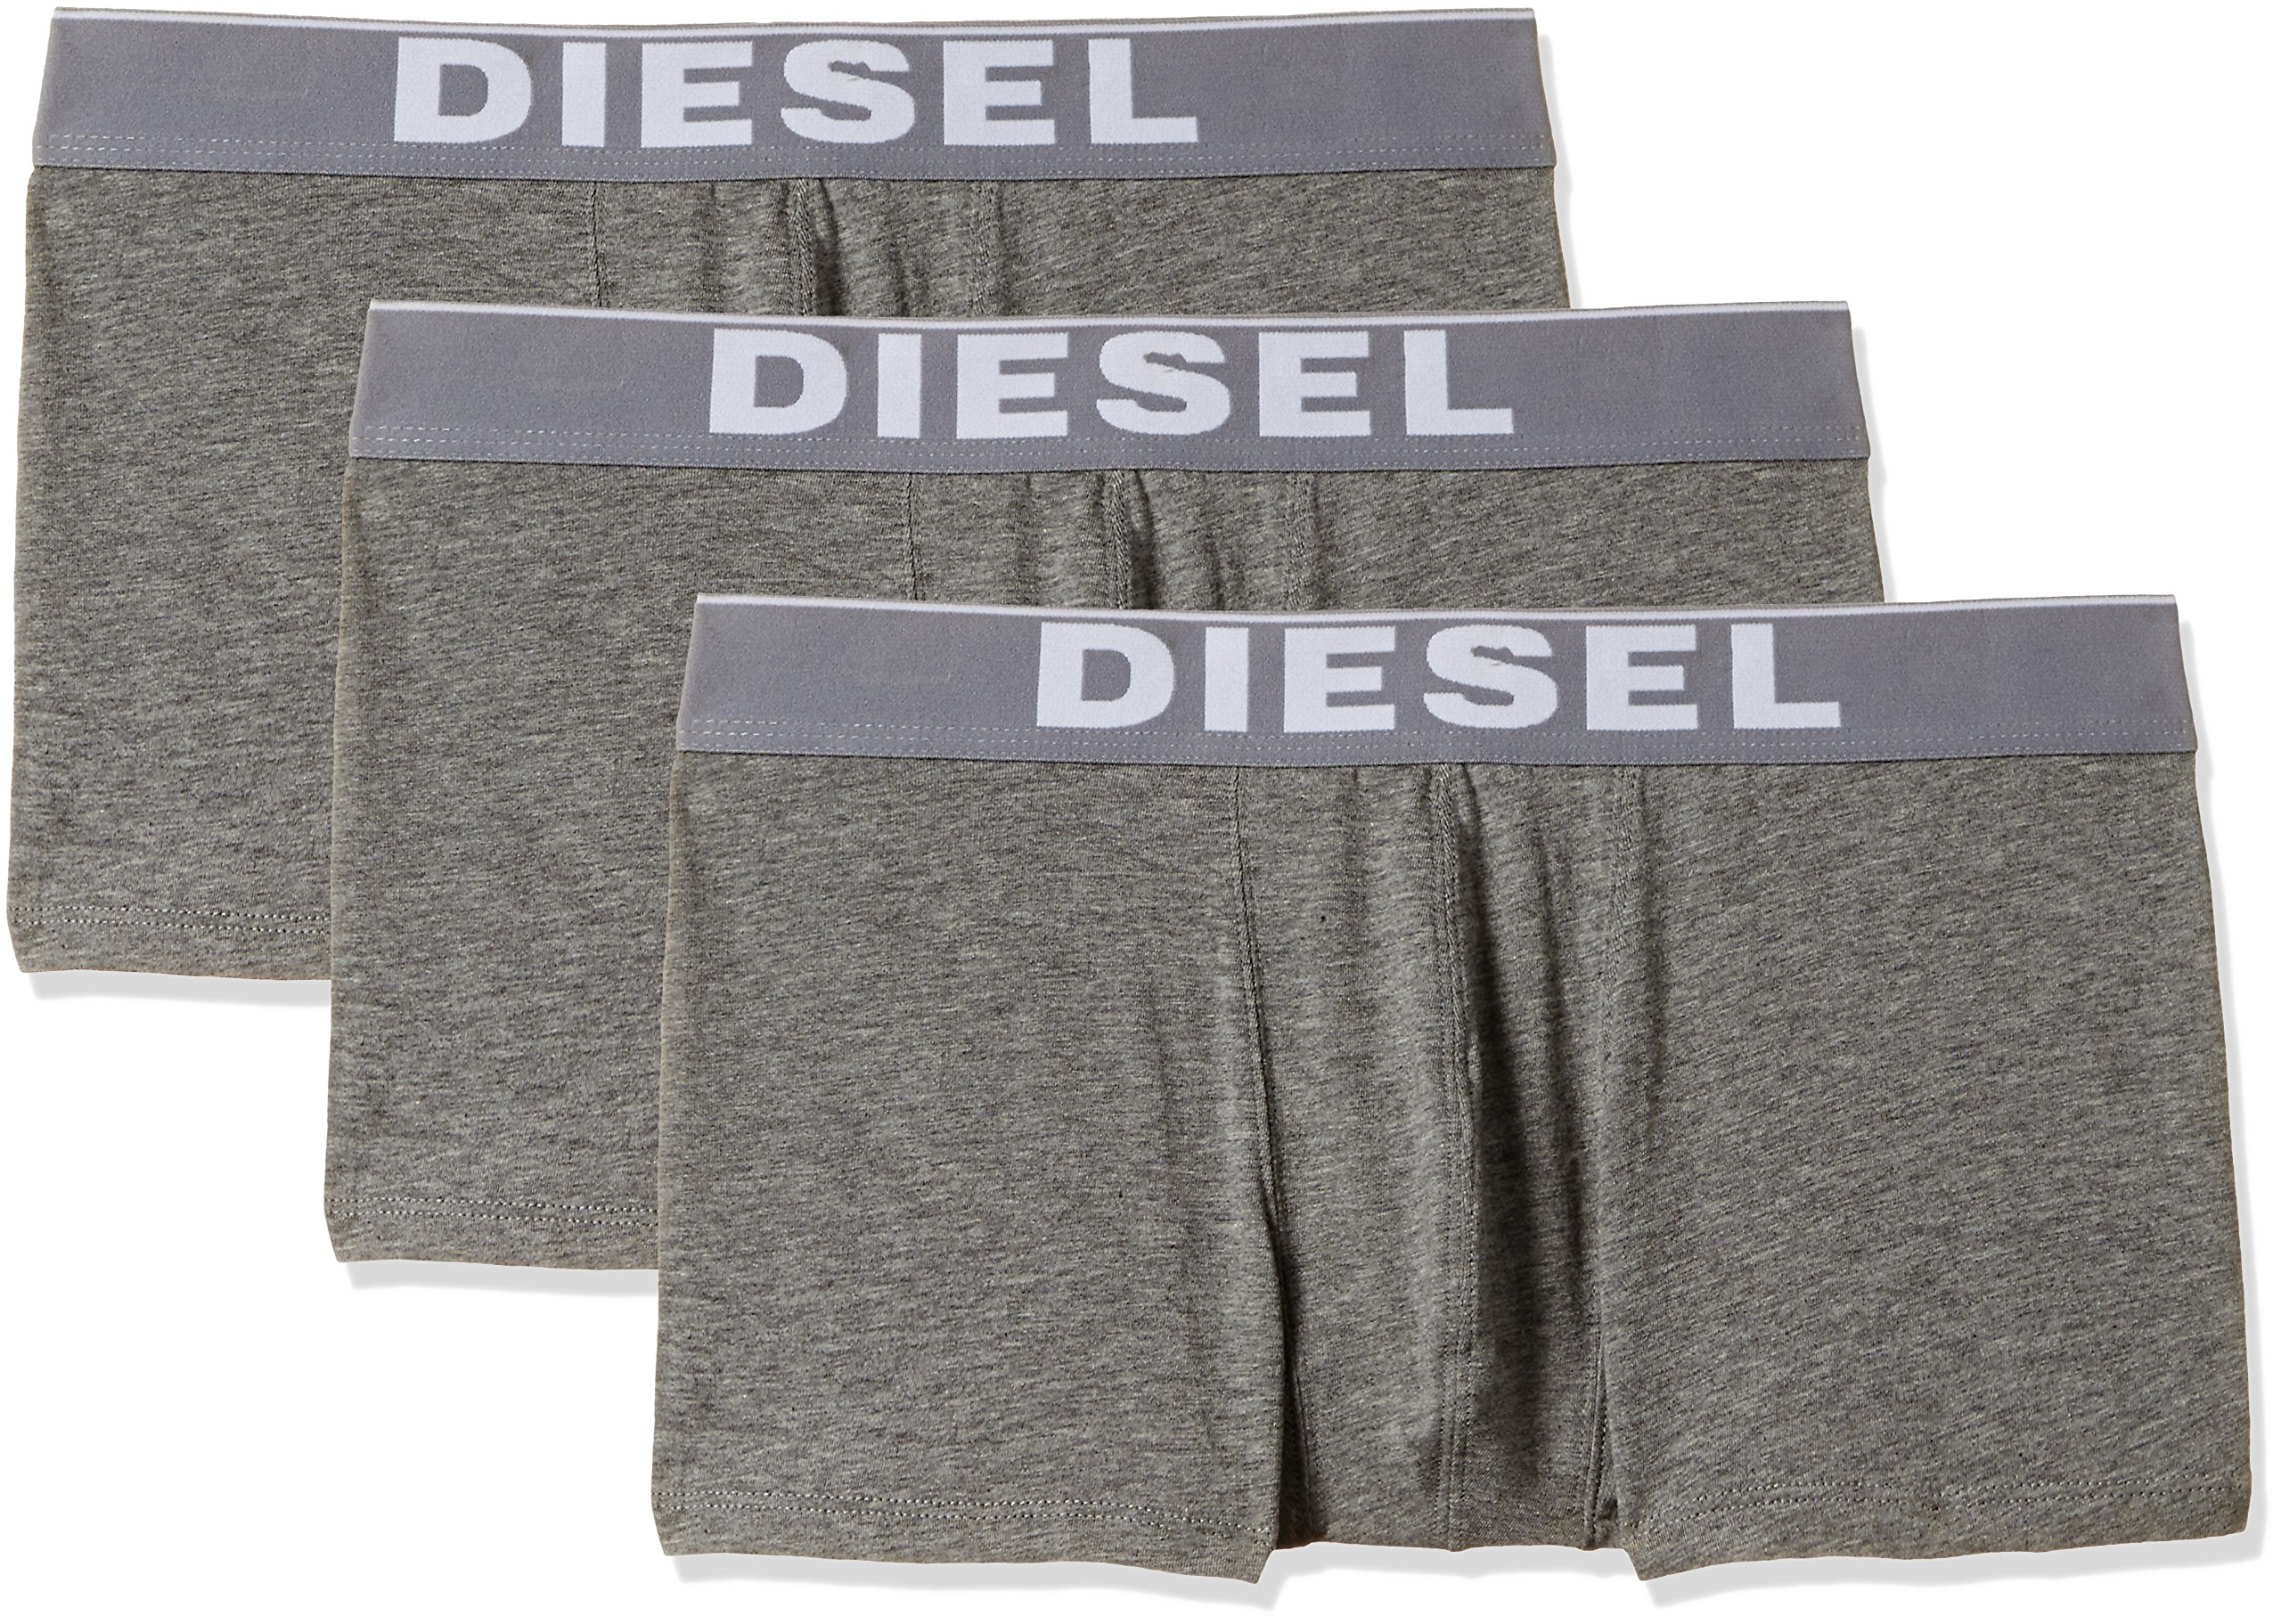 Diesel Calzoncillos (Pack de 3) para Hombre